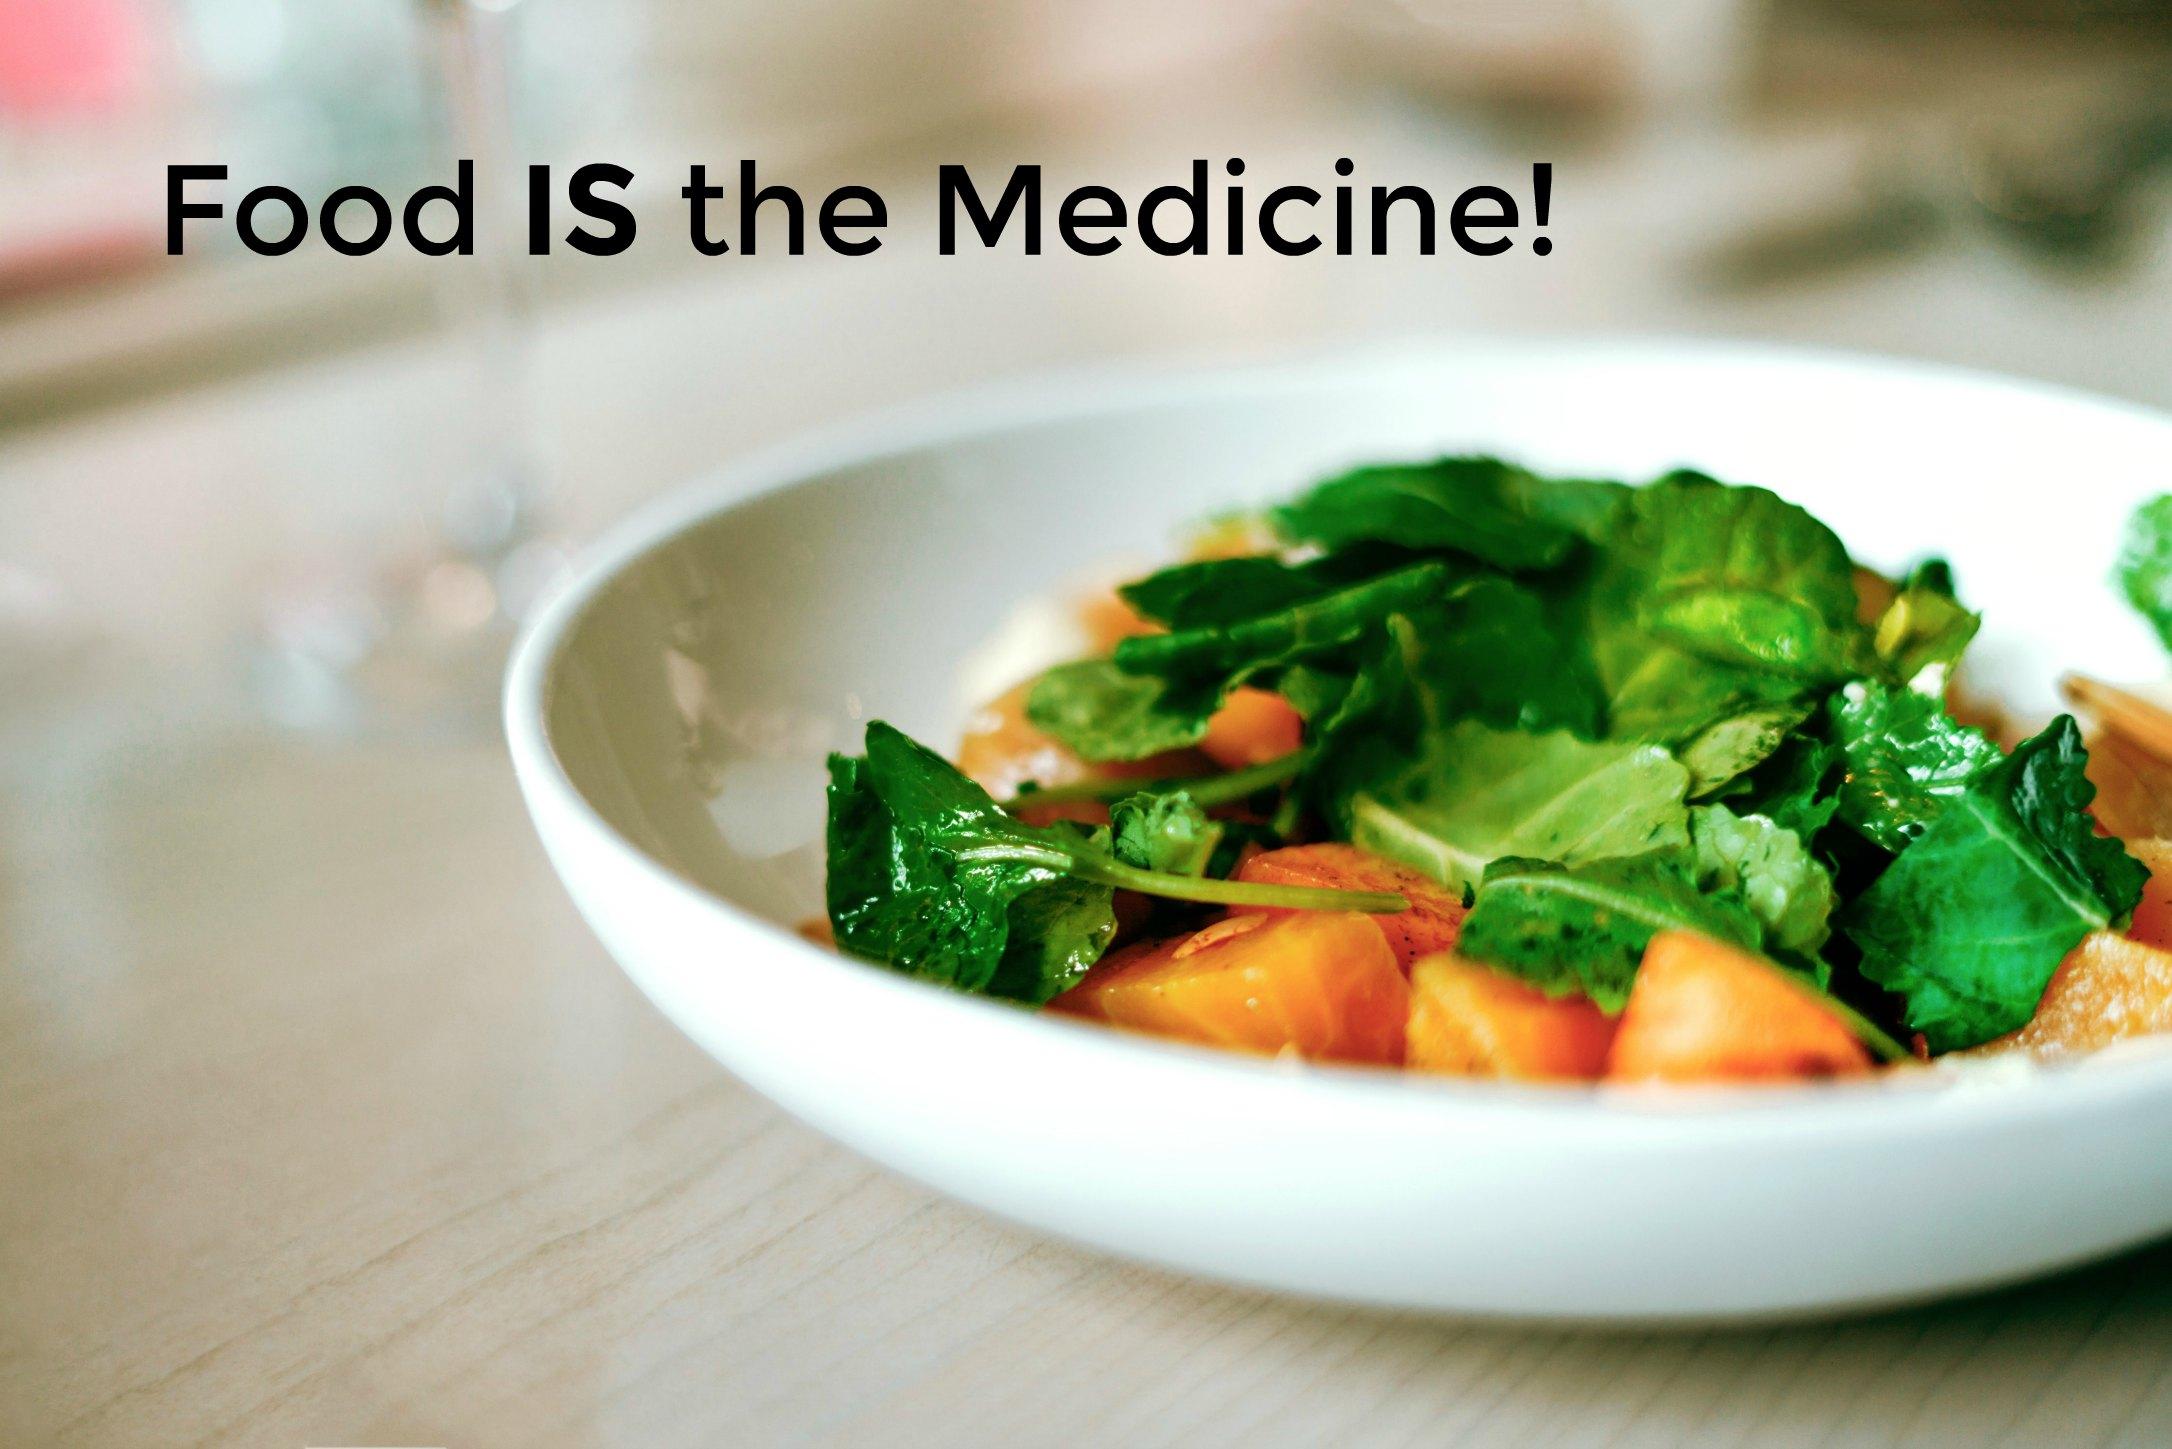 Food is the medicine.jpg